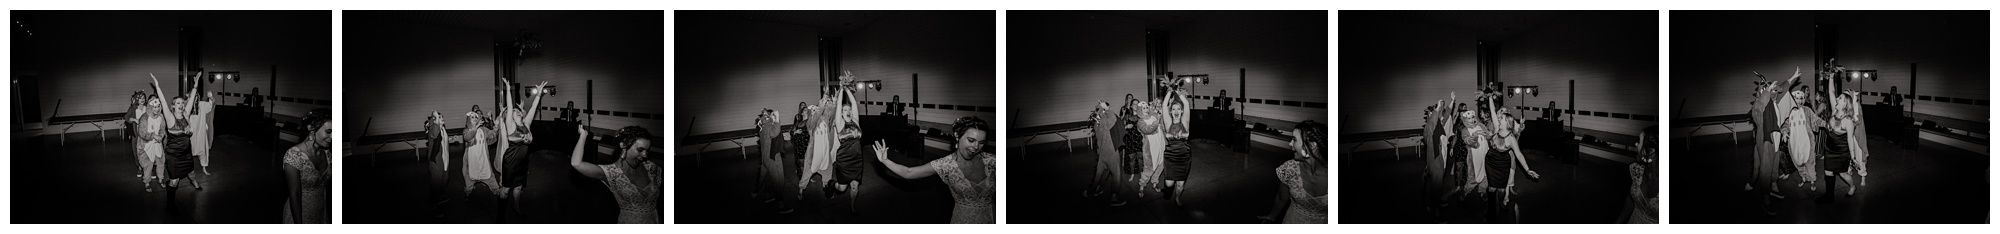 AUSTIN-TEXAS-PROSPECT-HOUSE-WEDDING-VENUE-PHOTOGRAPHY25860.JPG